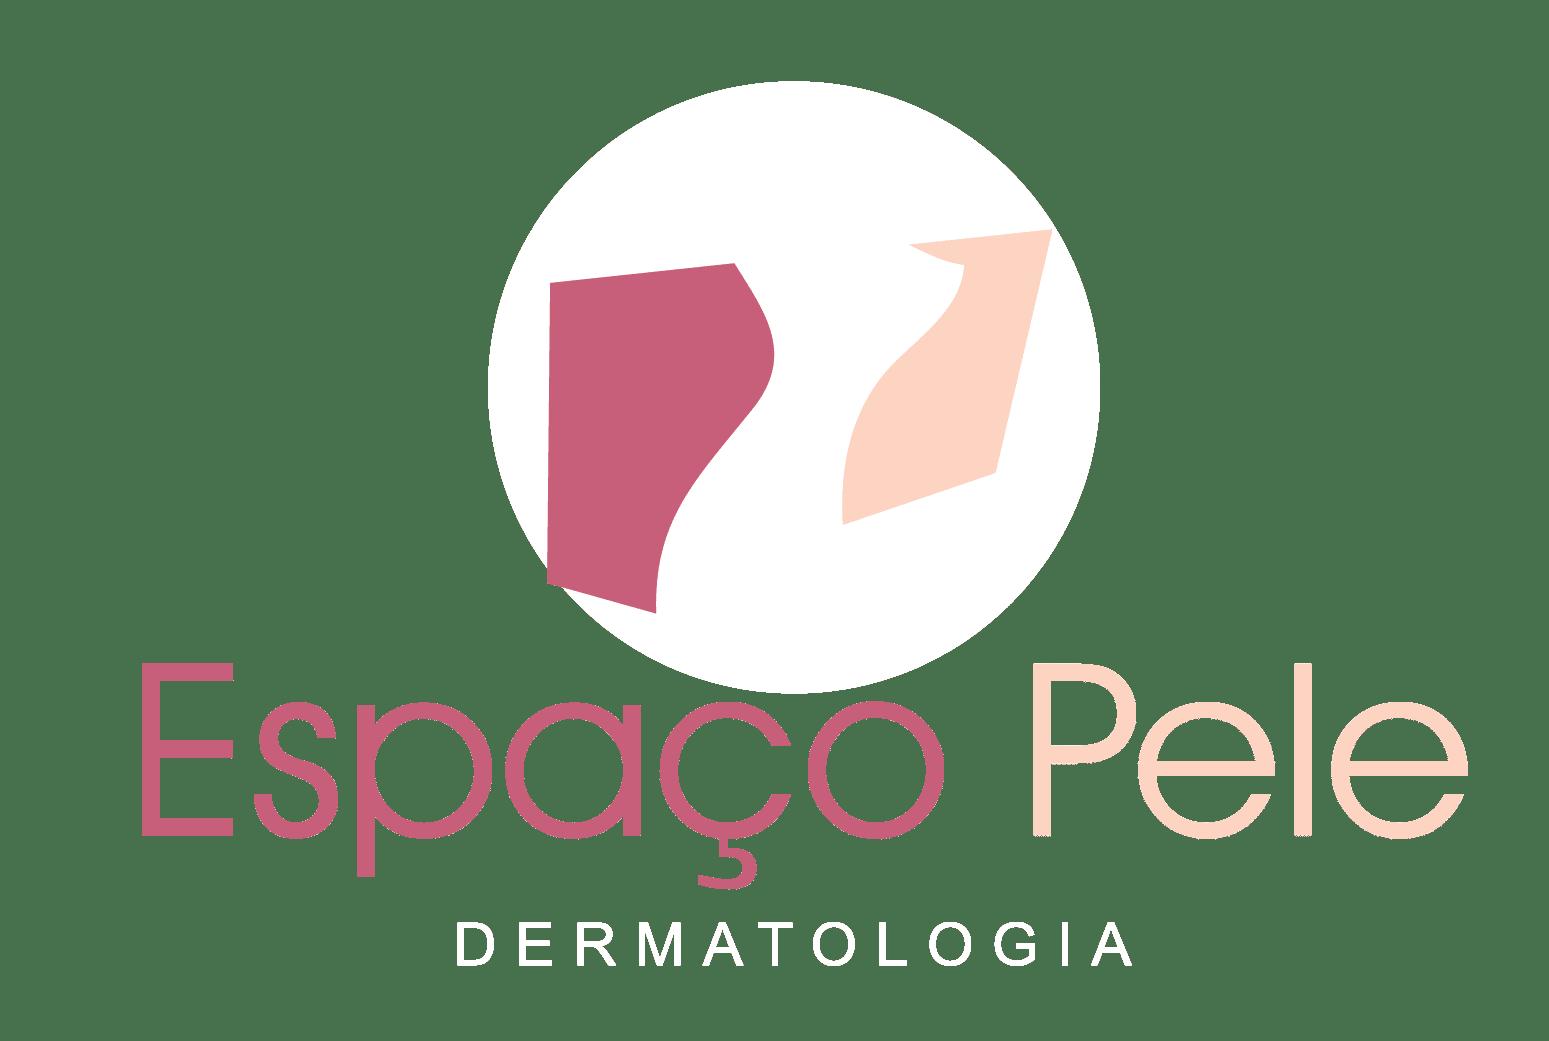 Espaço Pele Dermatologia